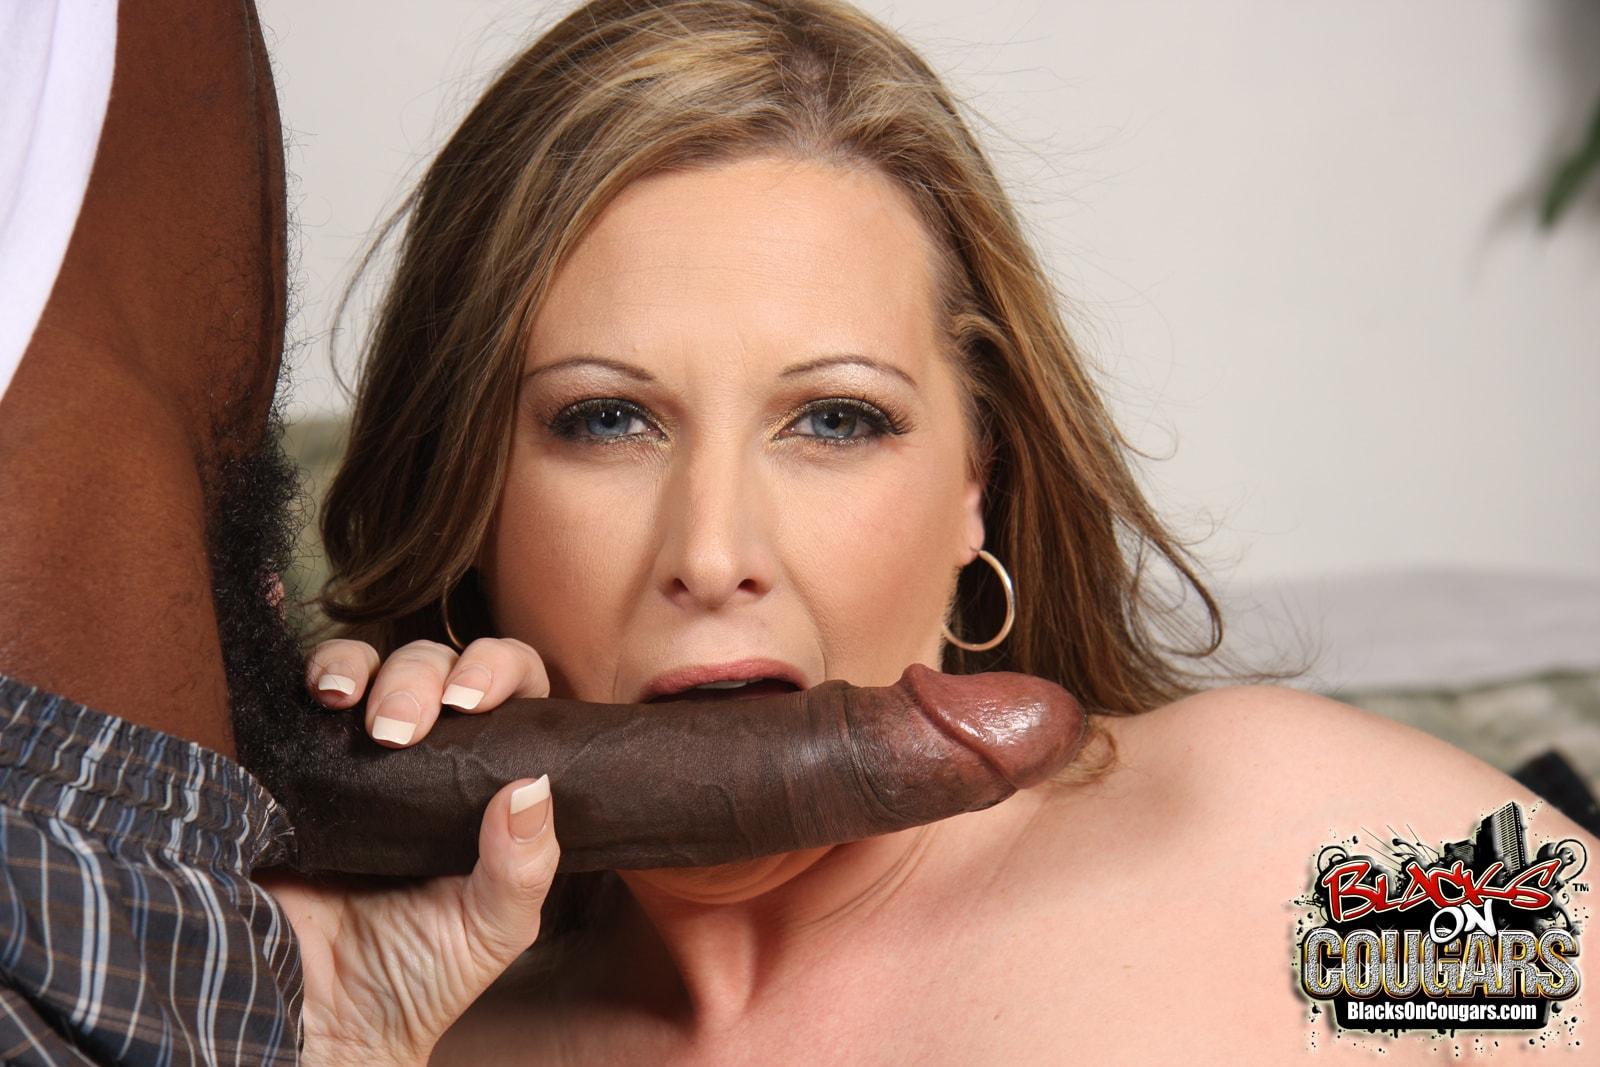 Dogfart '- Blacks On Cougars' starring Keira Kensley (Photo 21)